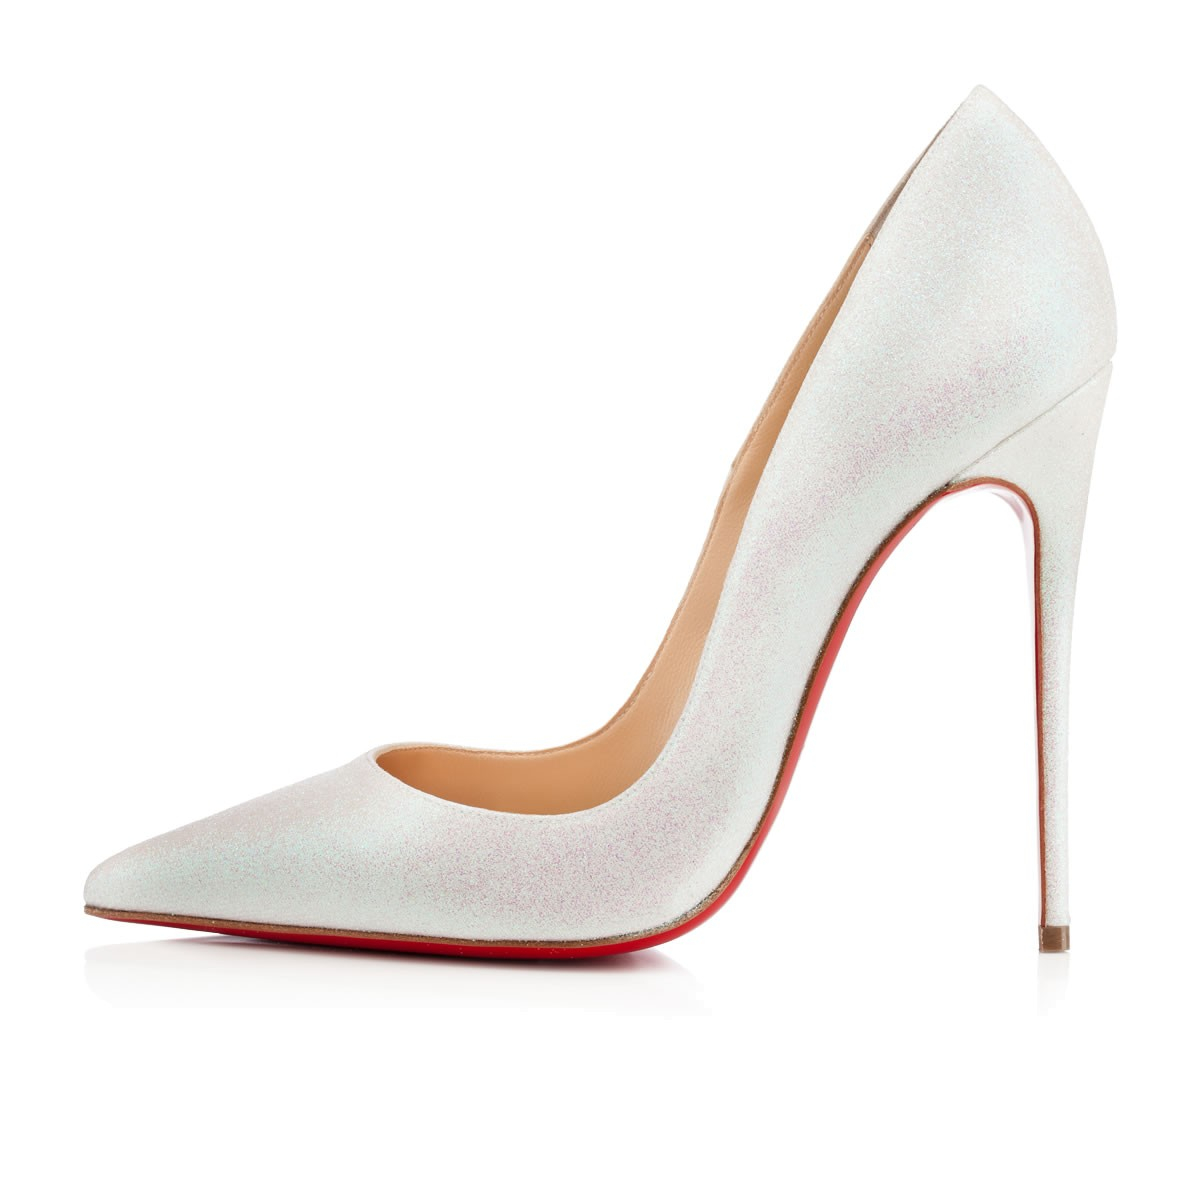 Christian louboutin So Kate Glitter in White (red) | Lyst